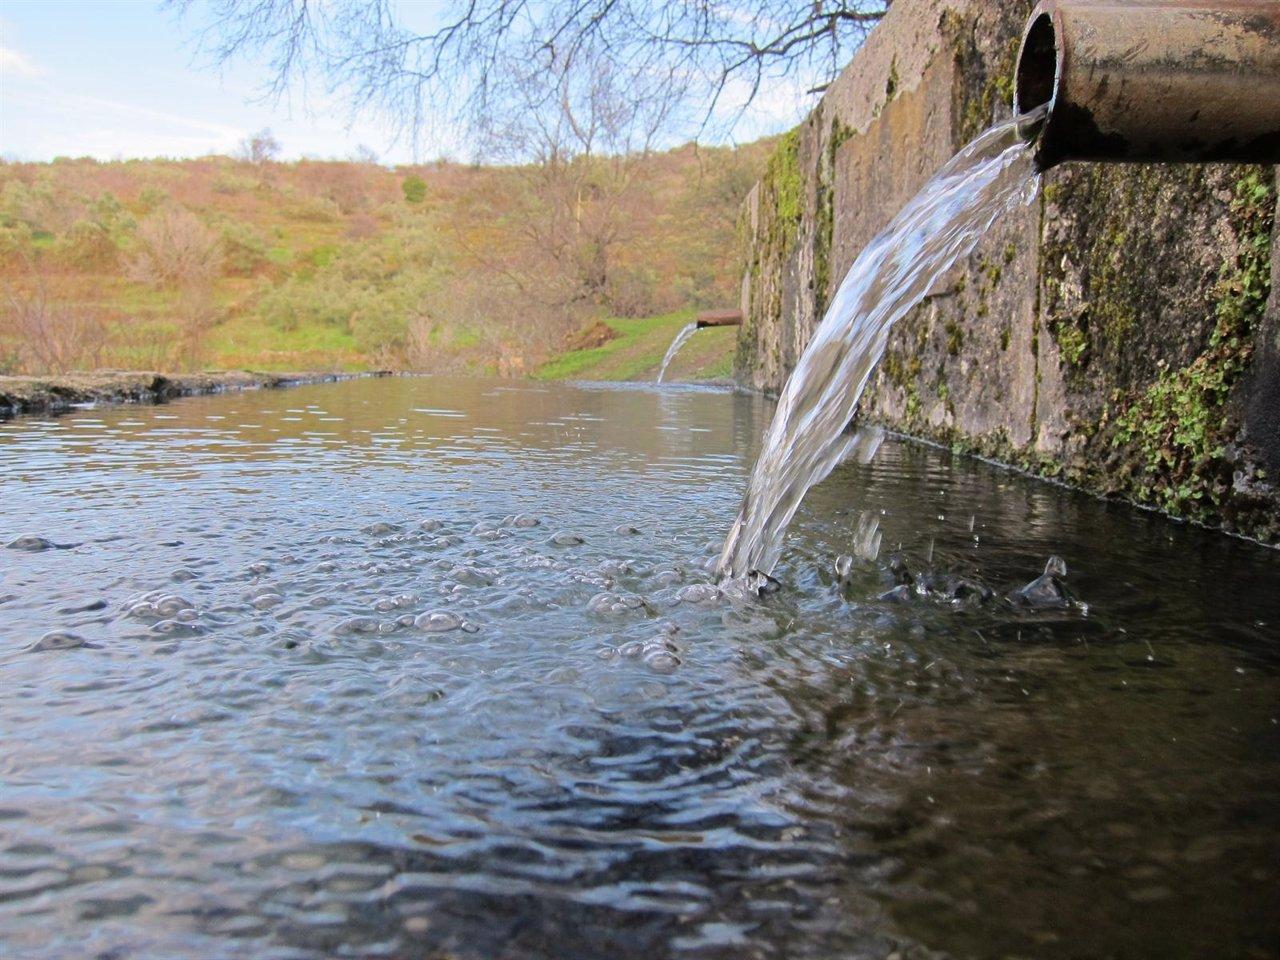 Agua. Caño. Pilar. Fuente.